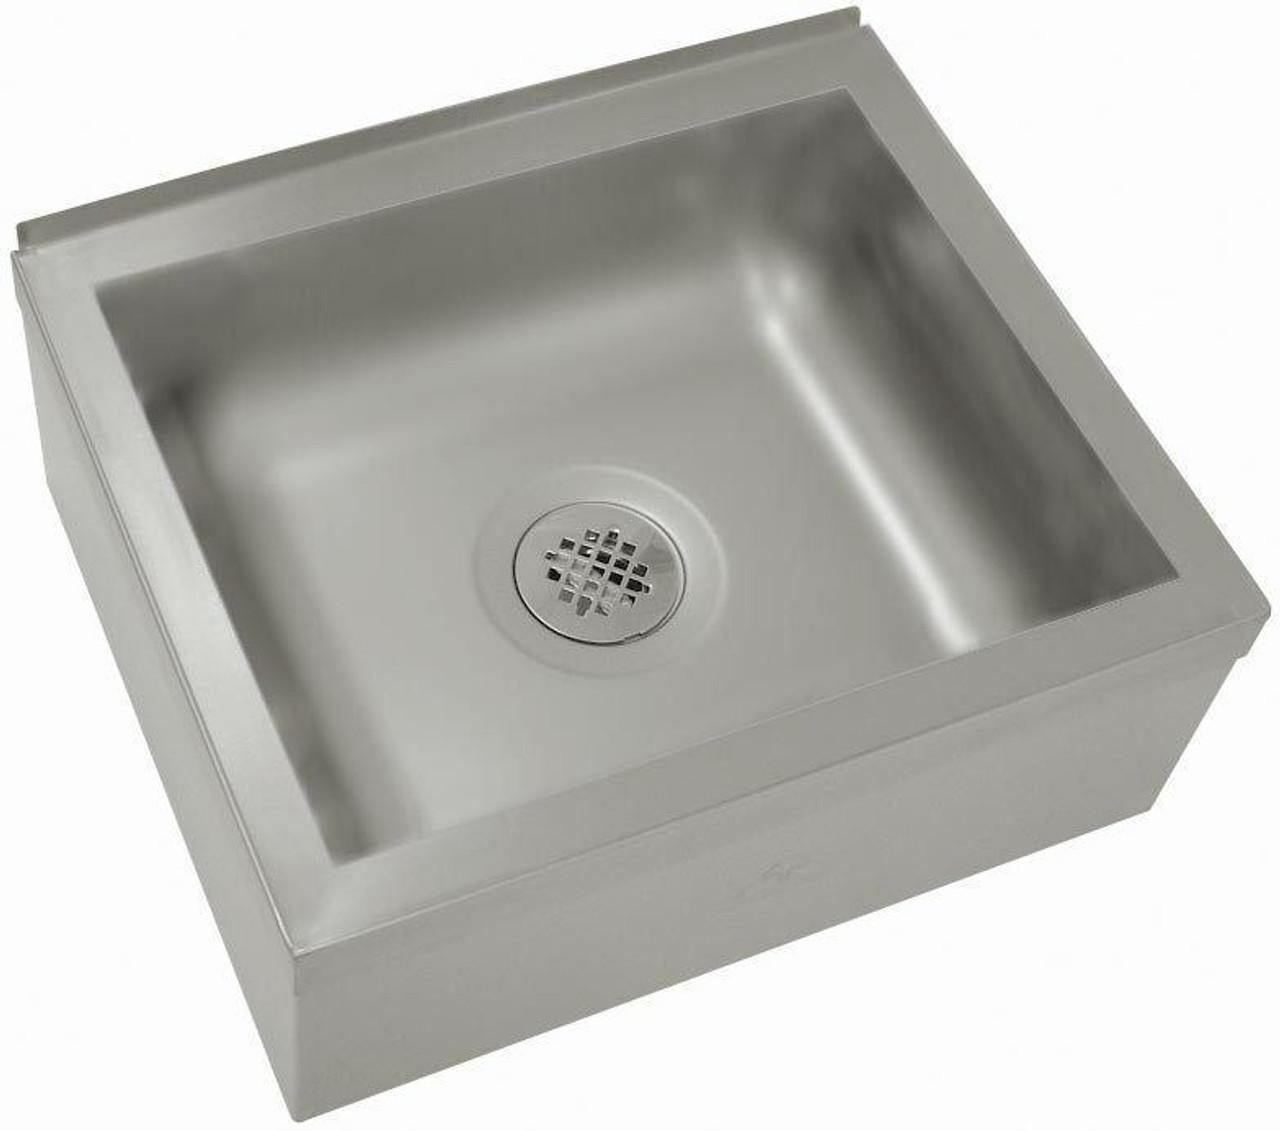 floor mounted mop sink 29 w x 29 d x 16 h